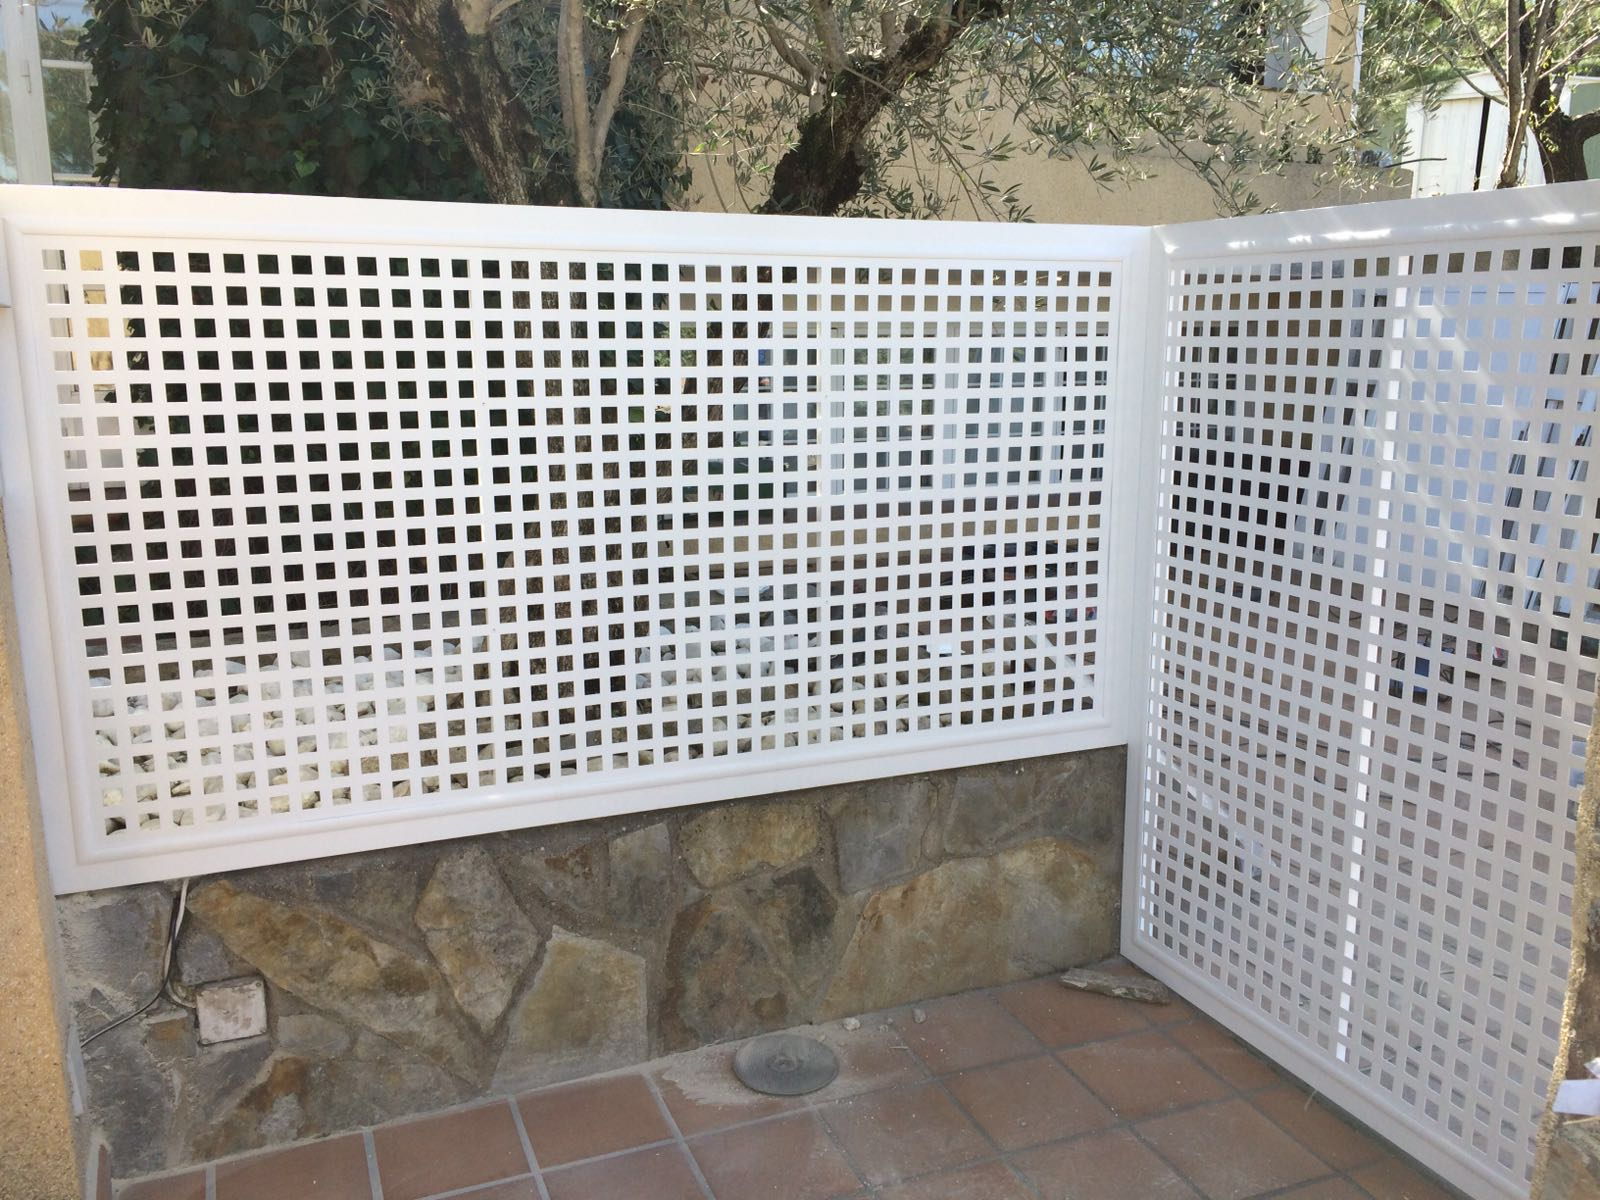 Planchas de aluminio madrid chapa granito pardo aluminio anodizado xmm with planchas de - Planchas metacrilato madrid ...